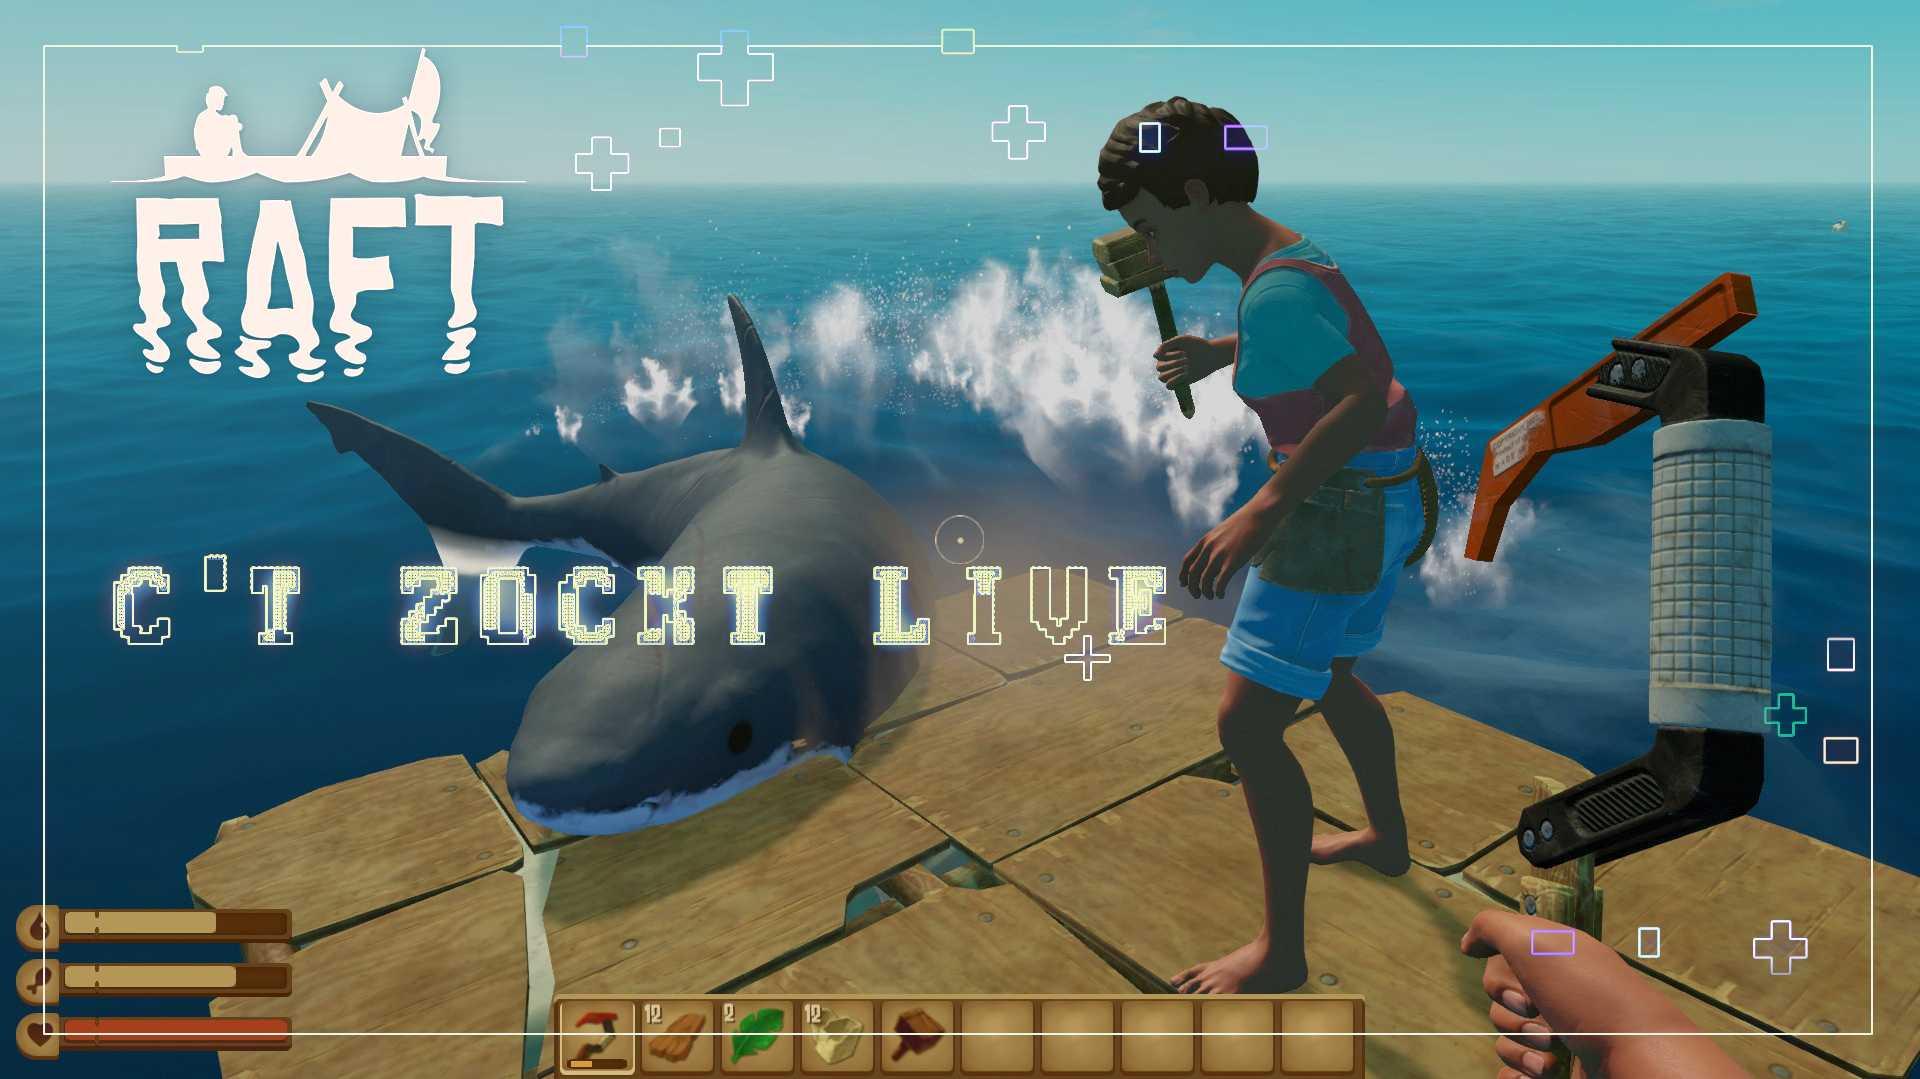 c't zockt LIVE: Raft - Hai-Life auf dem Floß